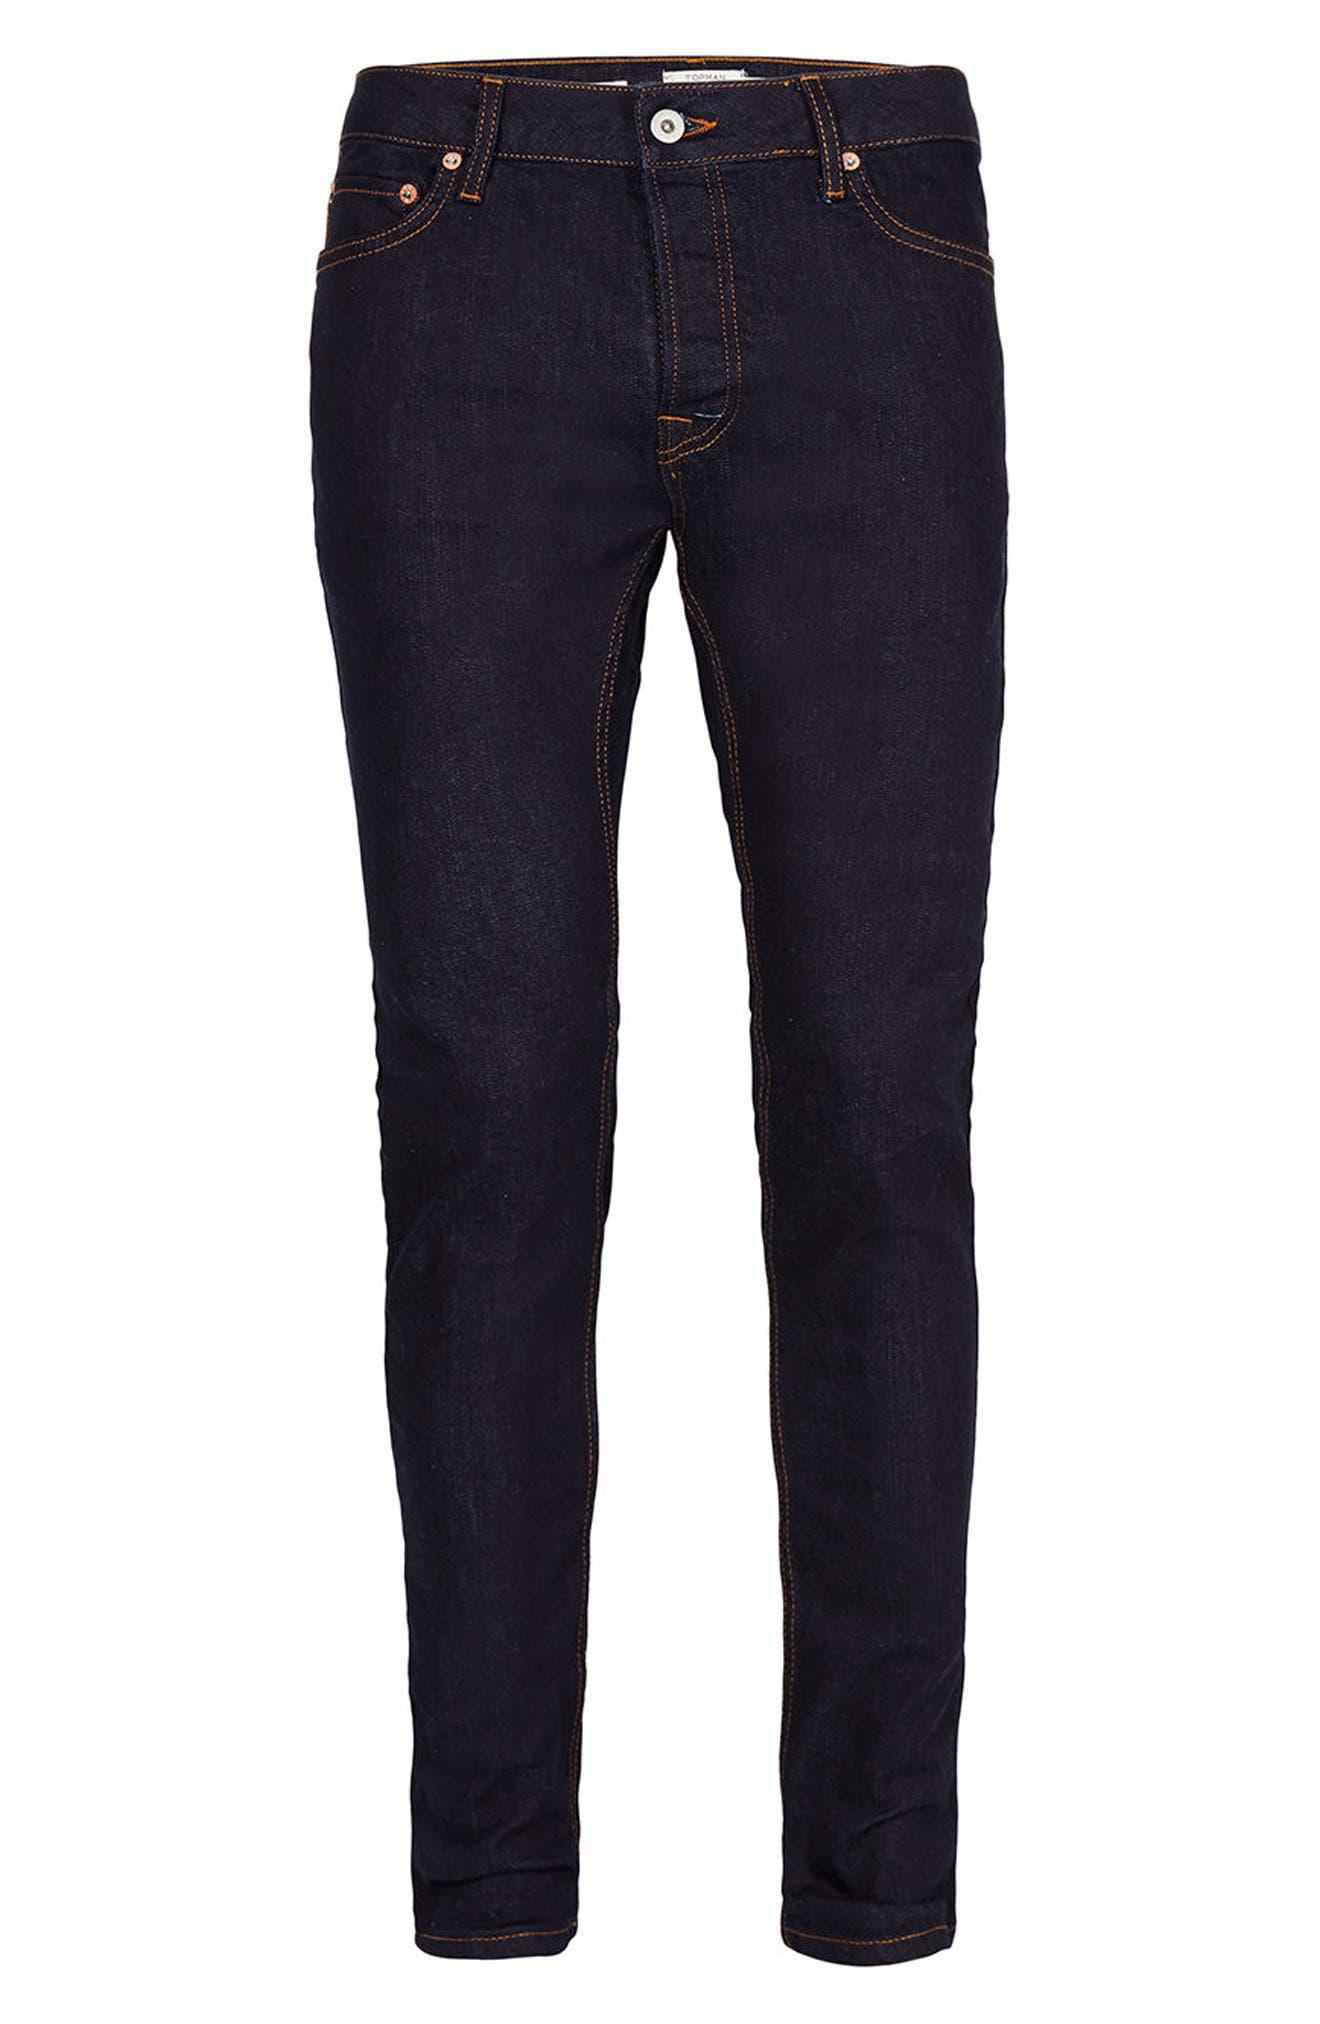 Stretch Skinny Fit Raw Denim Jeans,                             Alternate thumbnail 6, color,                             Blue